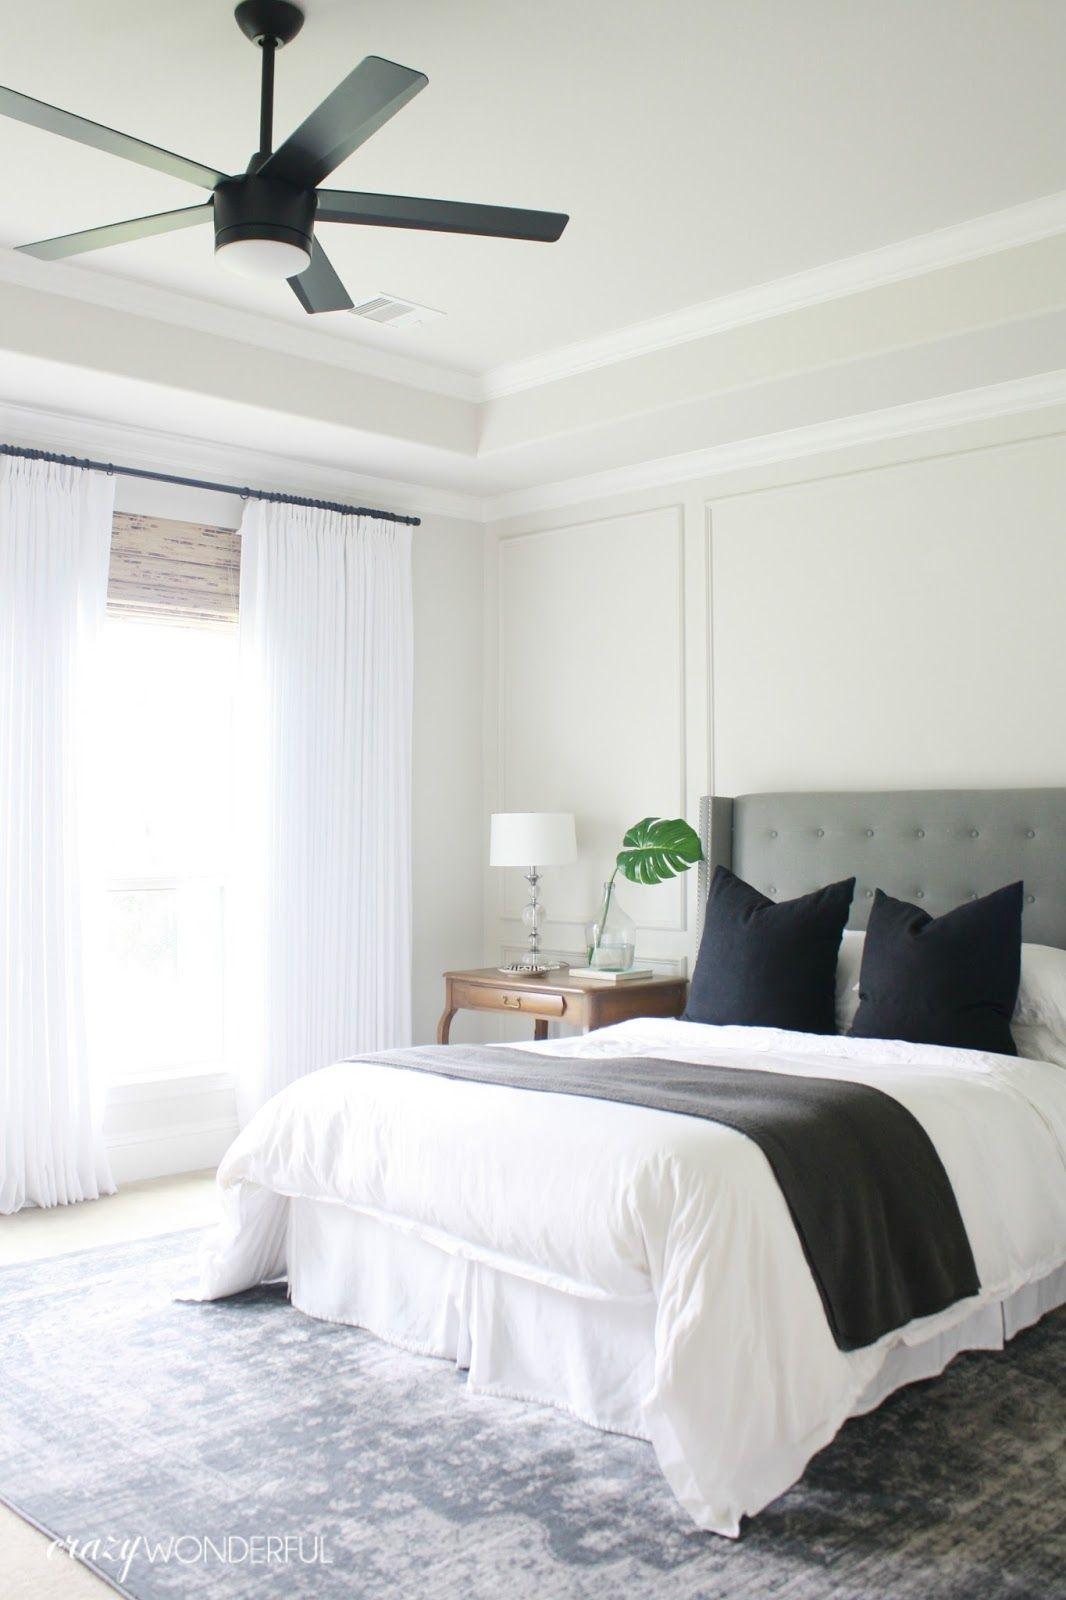 10+ Bedroom fans information